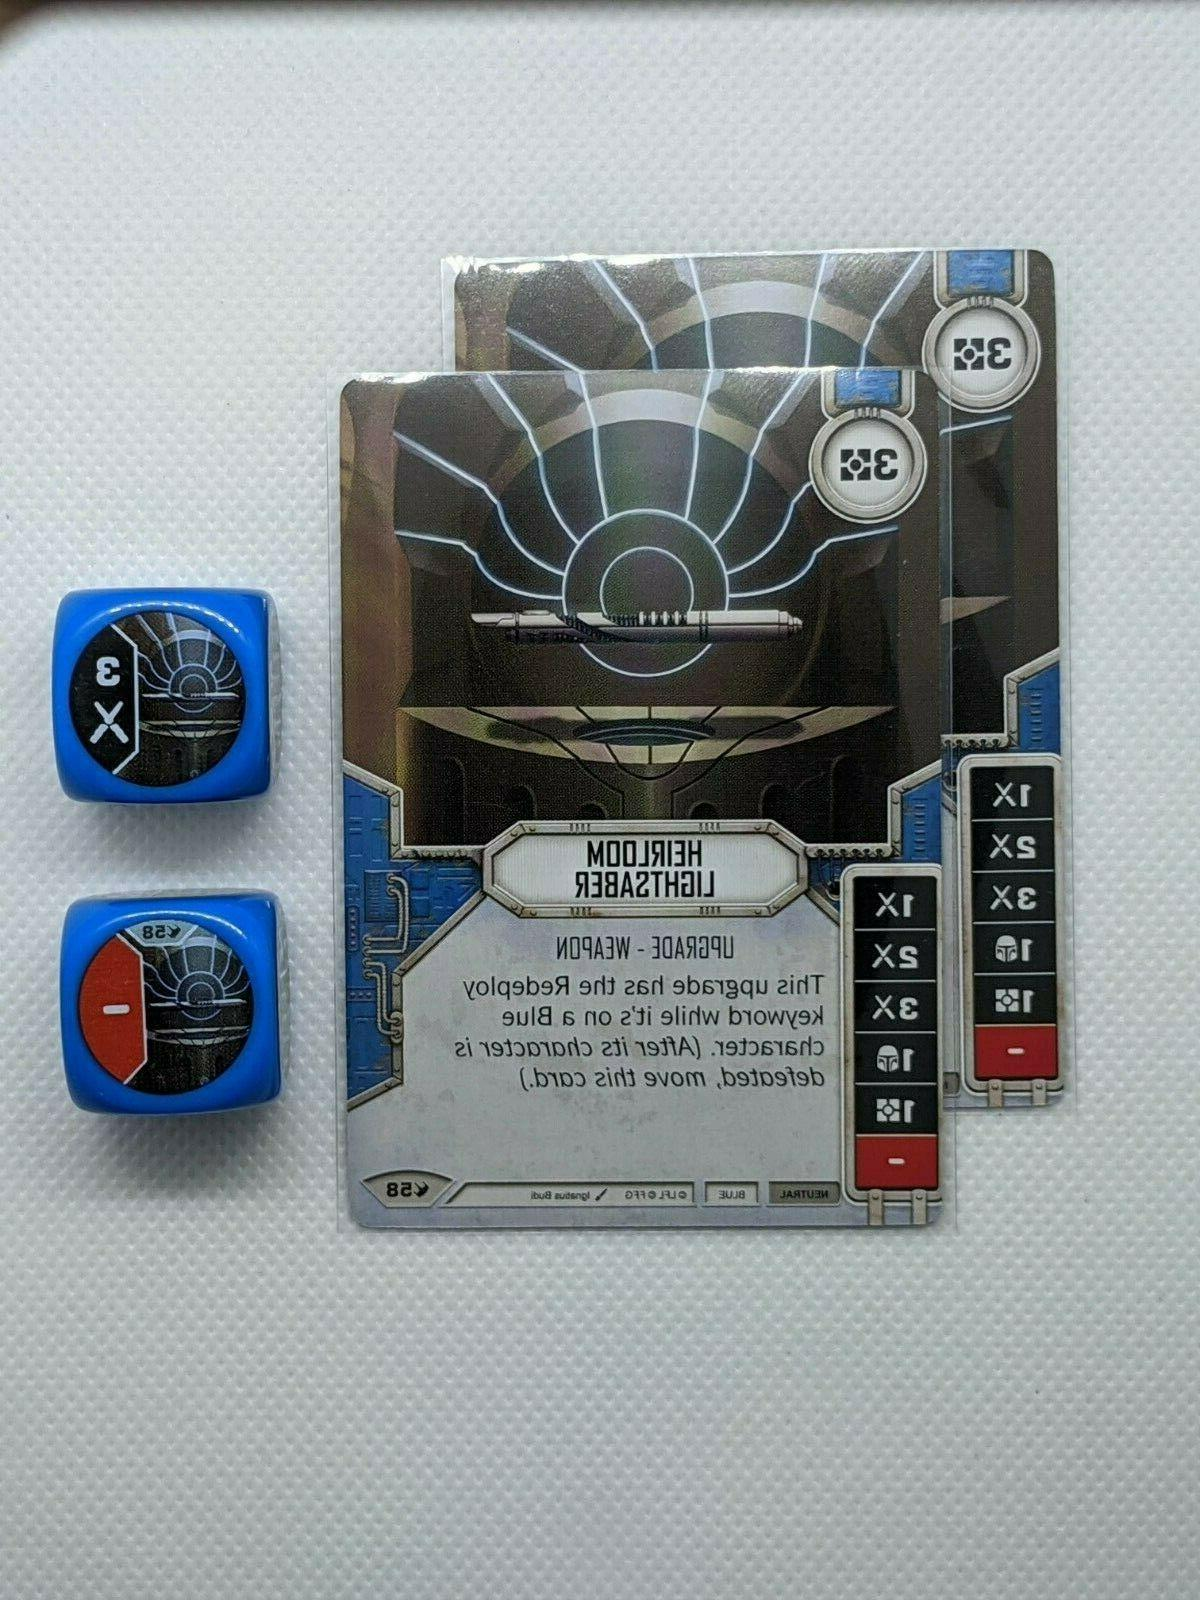 x2 heirloom lightsaber 58 star wars destiny